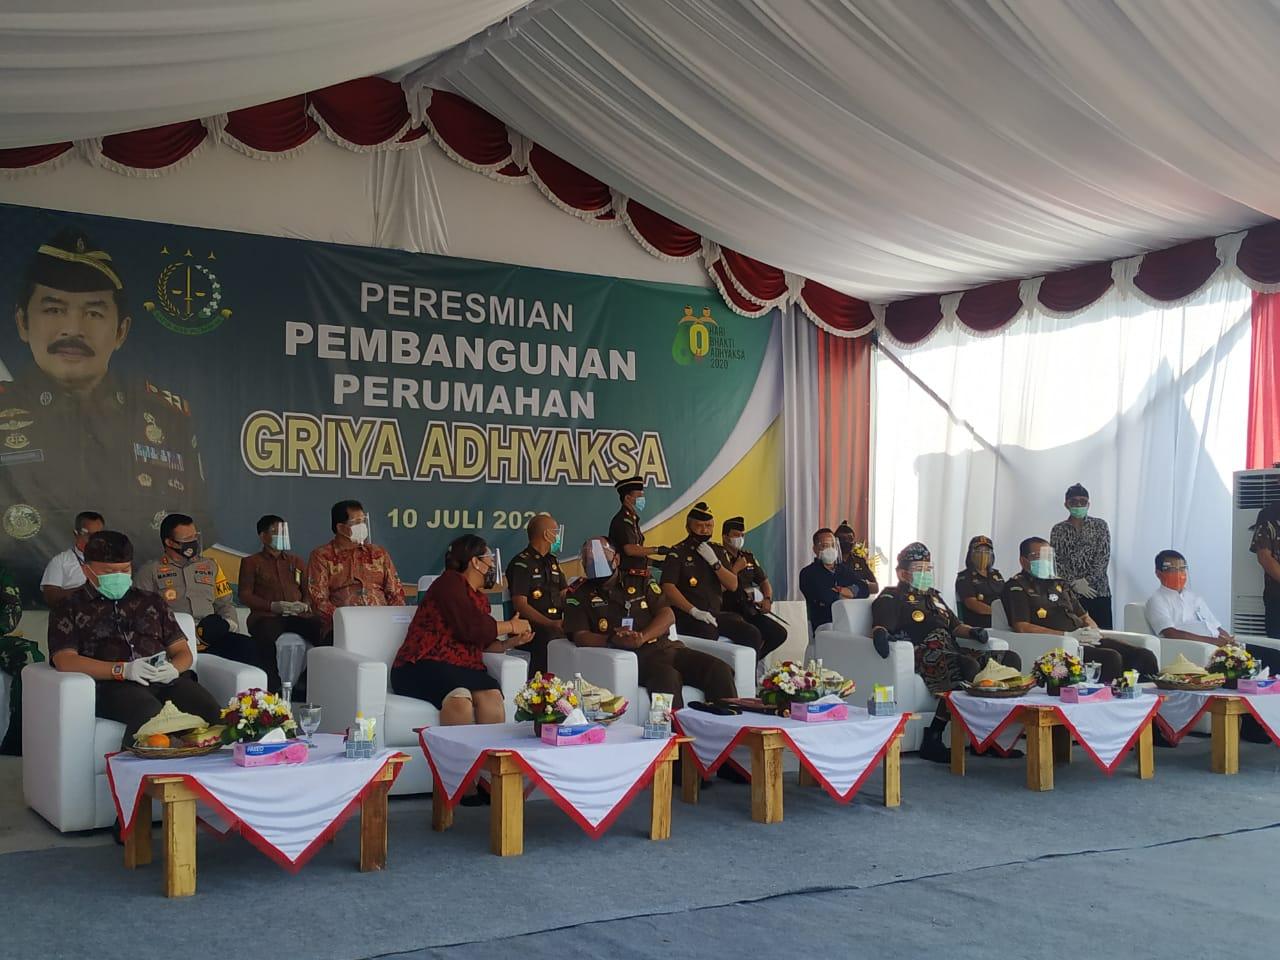 Peresmian Pembangunan Perumahan Griya Adhyaksa oleh Jaksa Agung RI